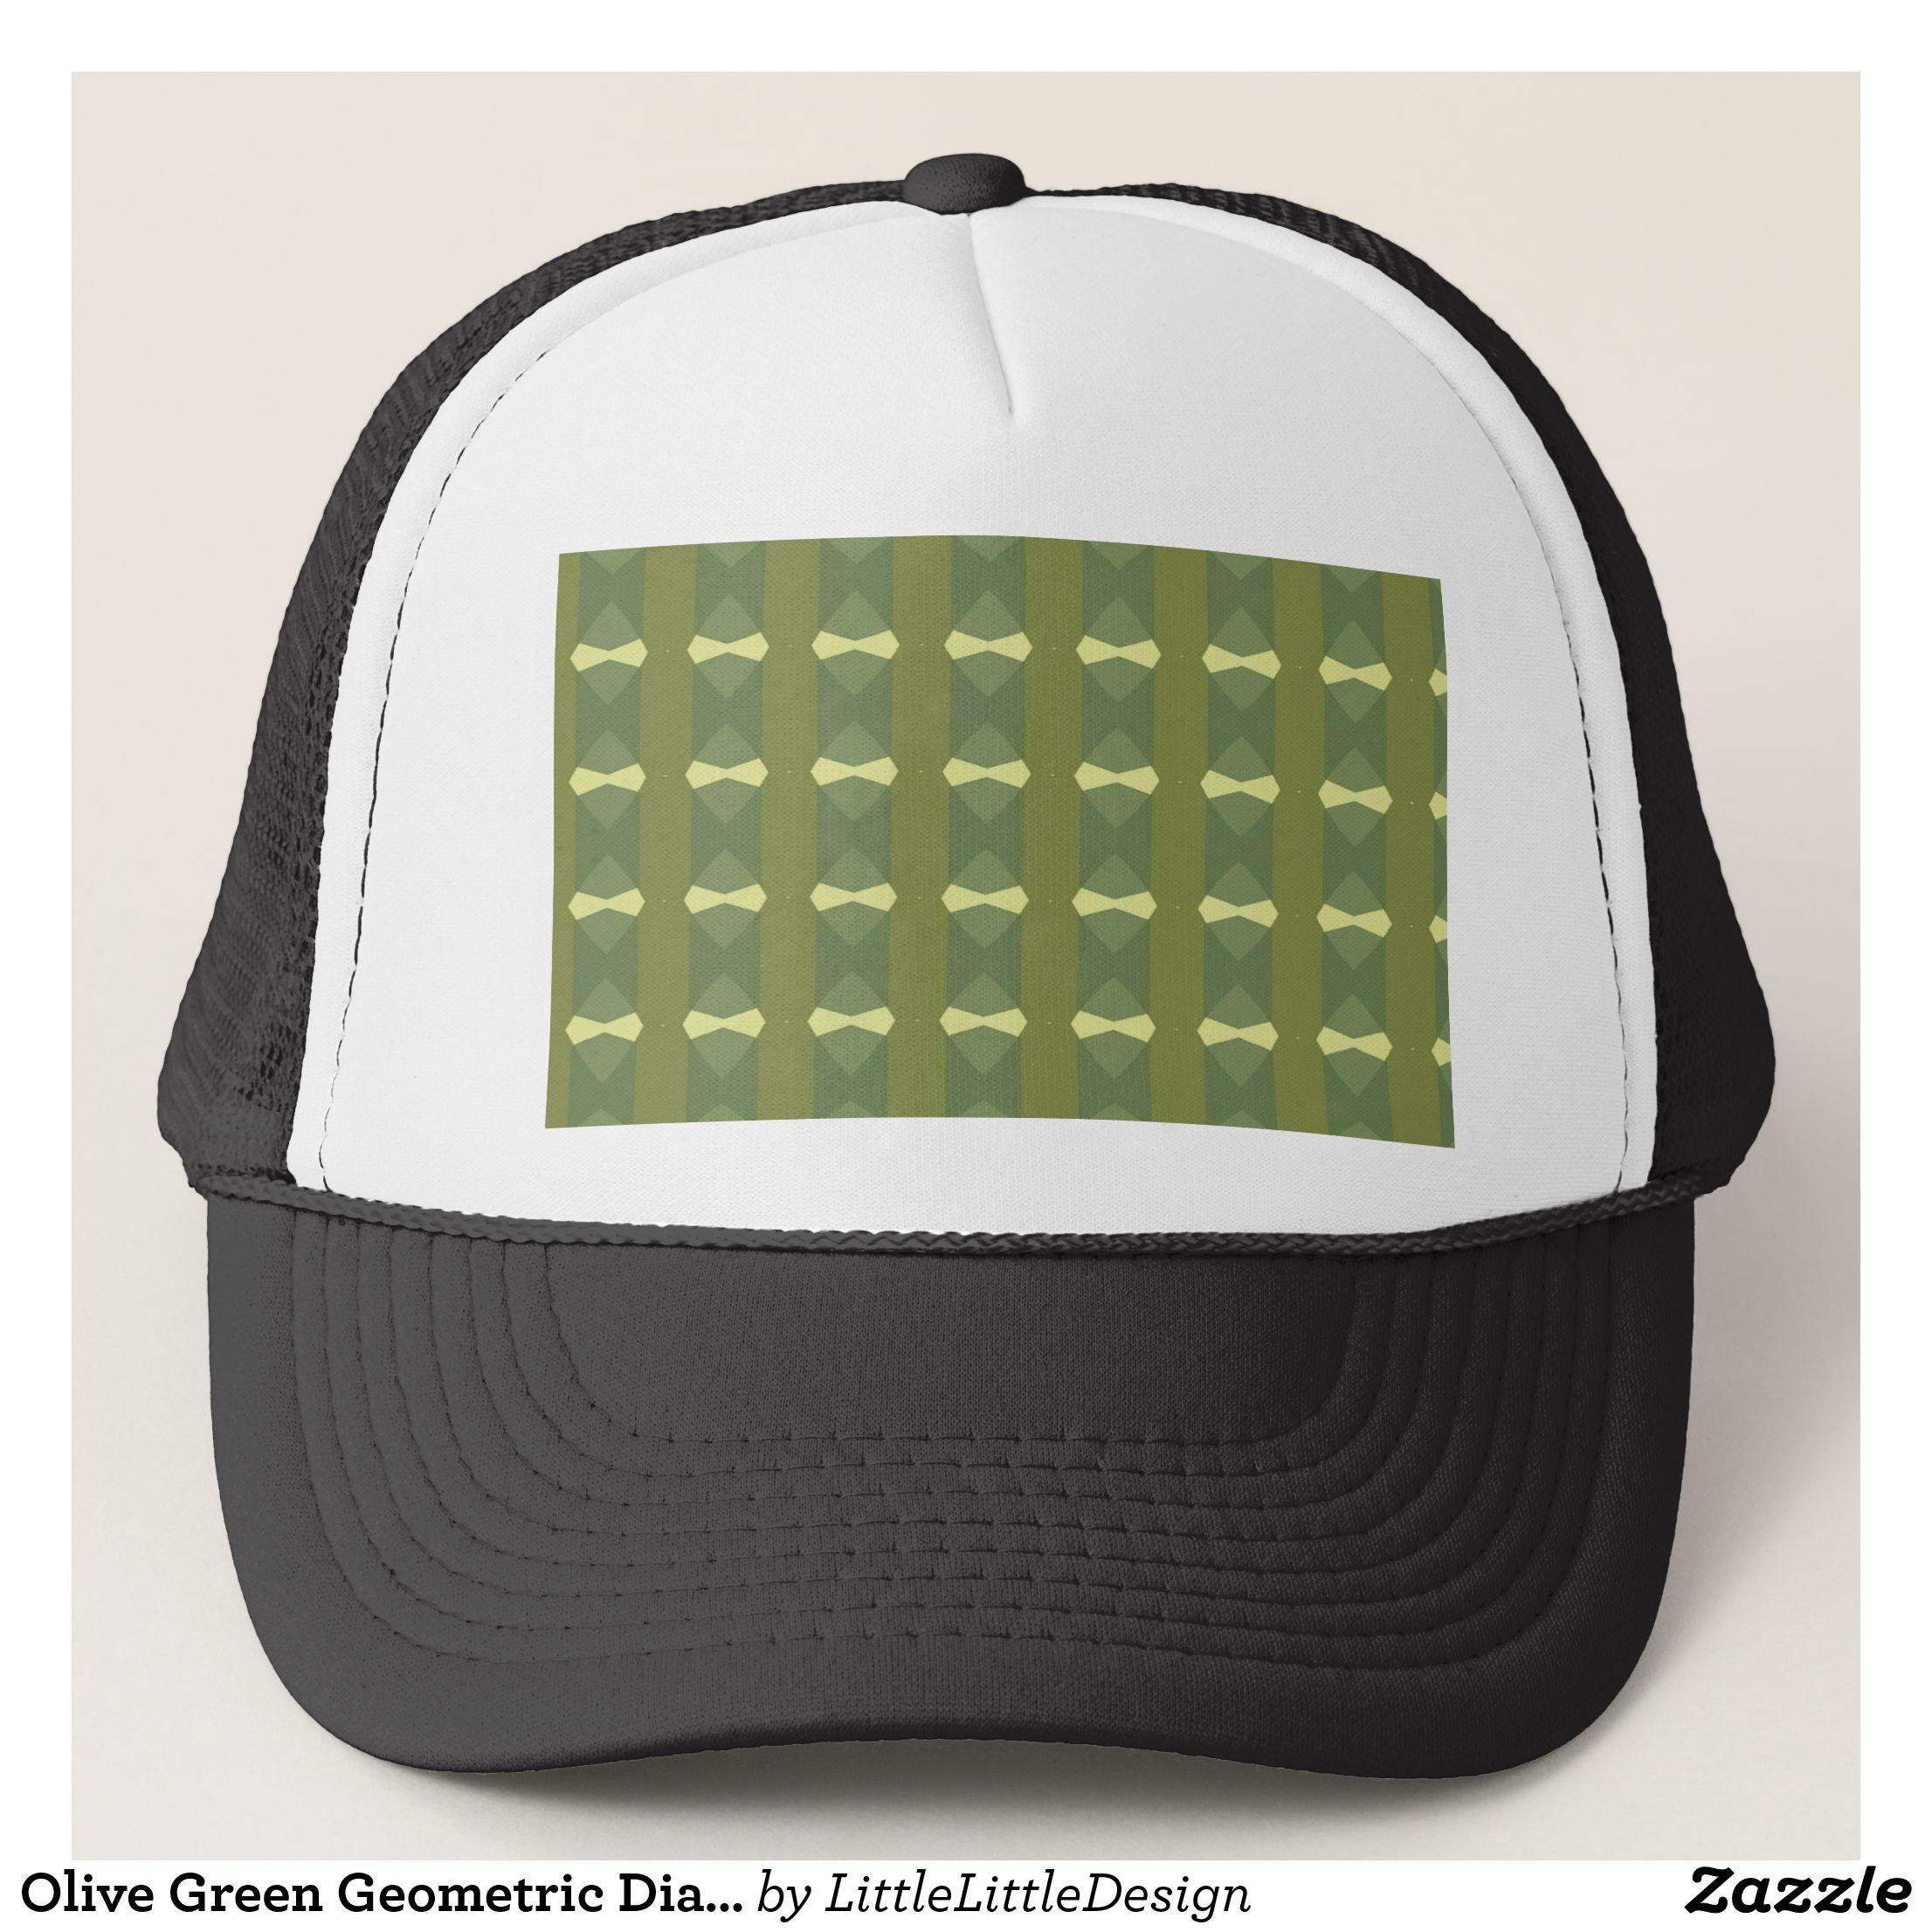 Olive Green Geometric Diamond Stripes Pattern Trucker Hat  bfefff2a897